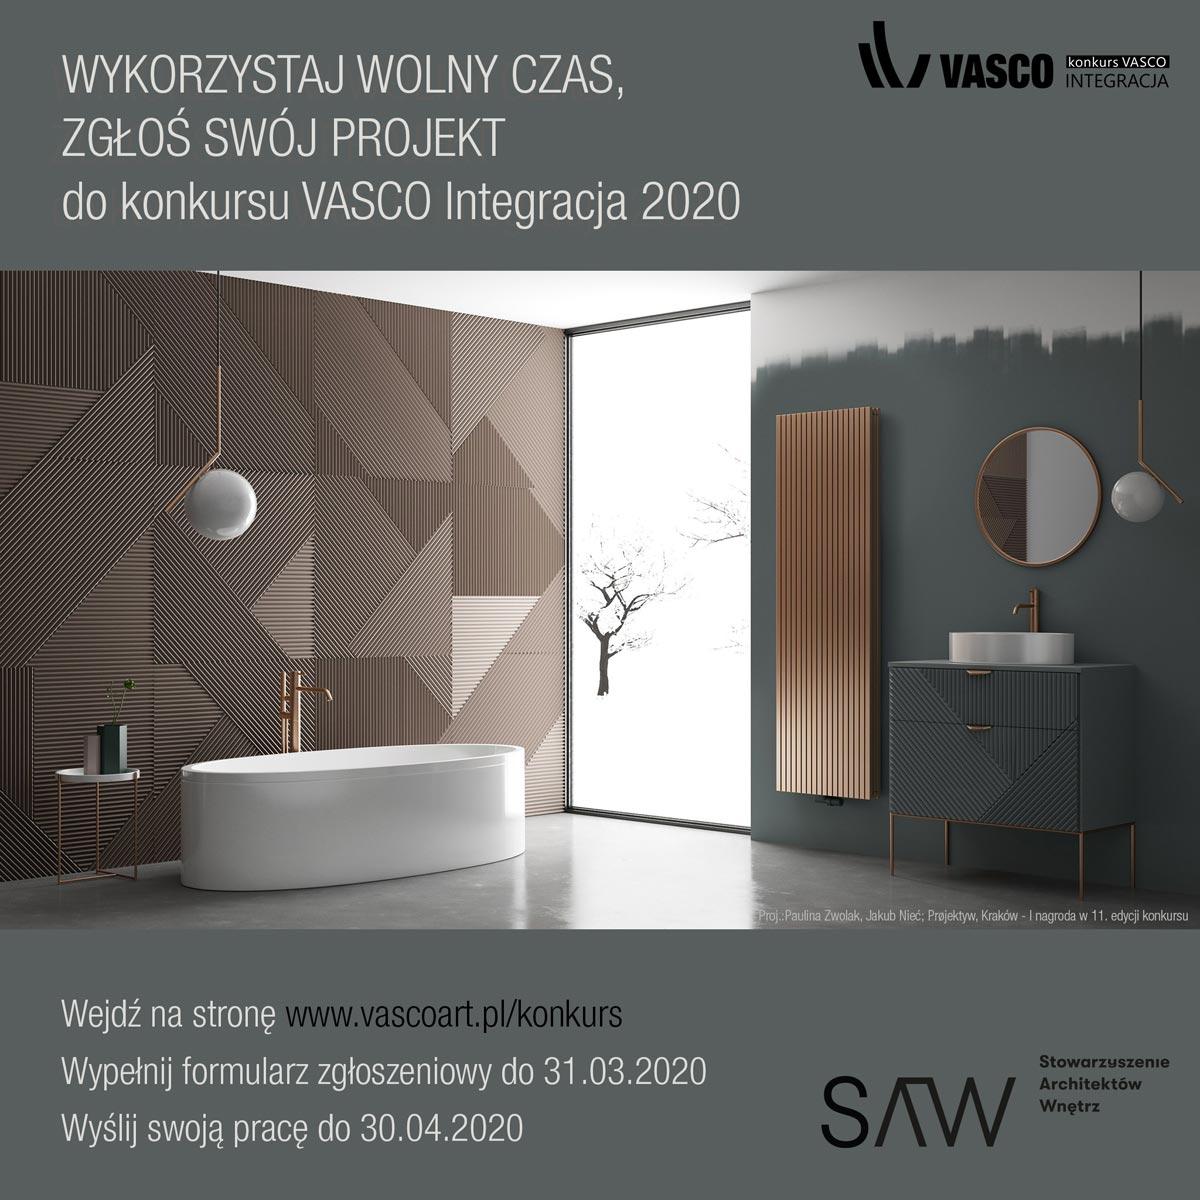 Konkurs VASCO Integracja 2020